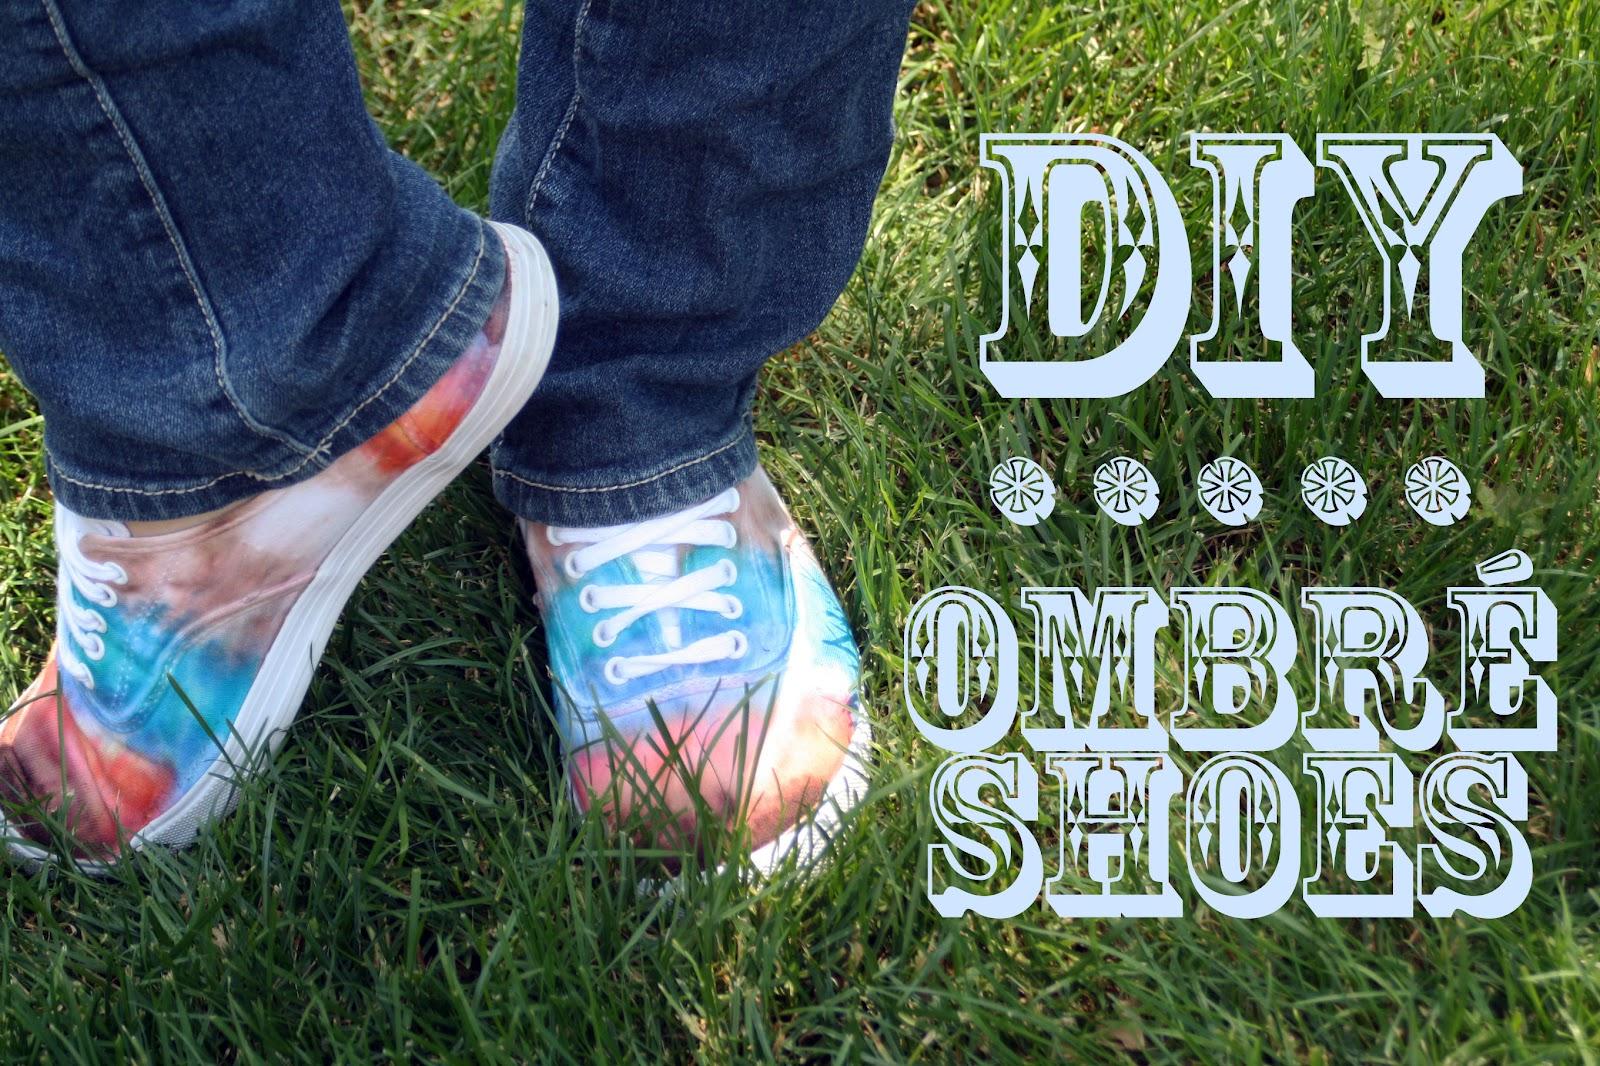 http://3.bp.blogspot.com/-GUxTuoNupTQ/T8gpXy_AepI/AAAAAAAAAWw/JPbCTP95tYE/s1600/DIY%2Bombre%2Bshoes.jpg